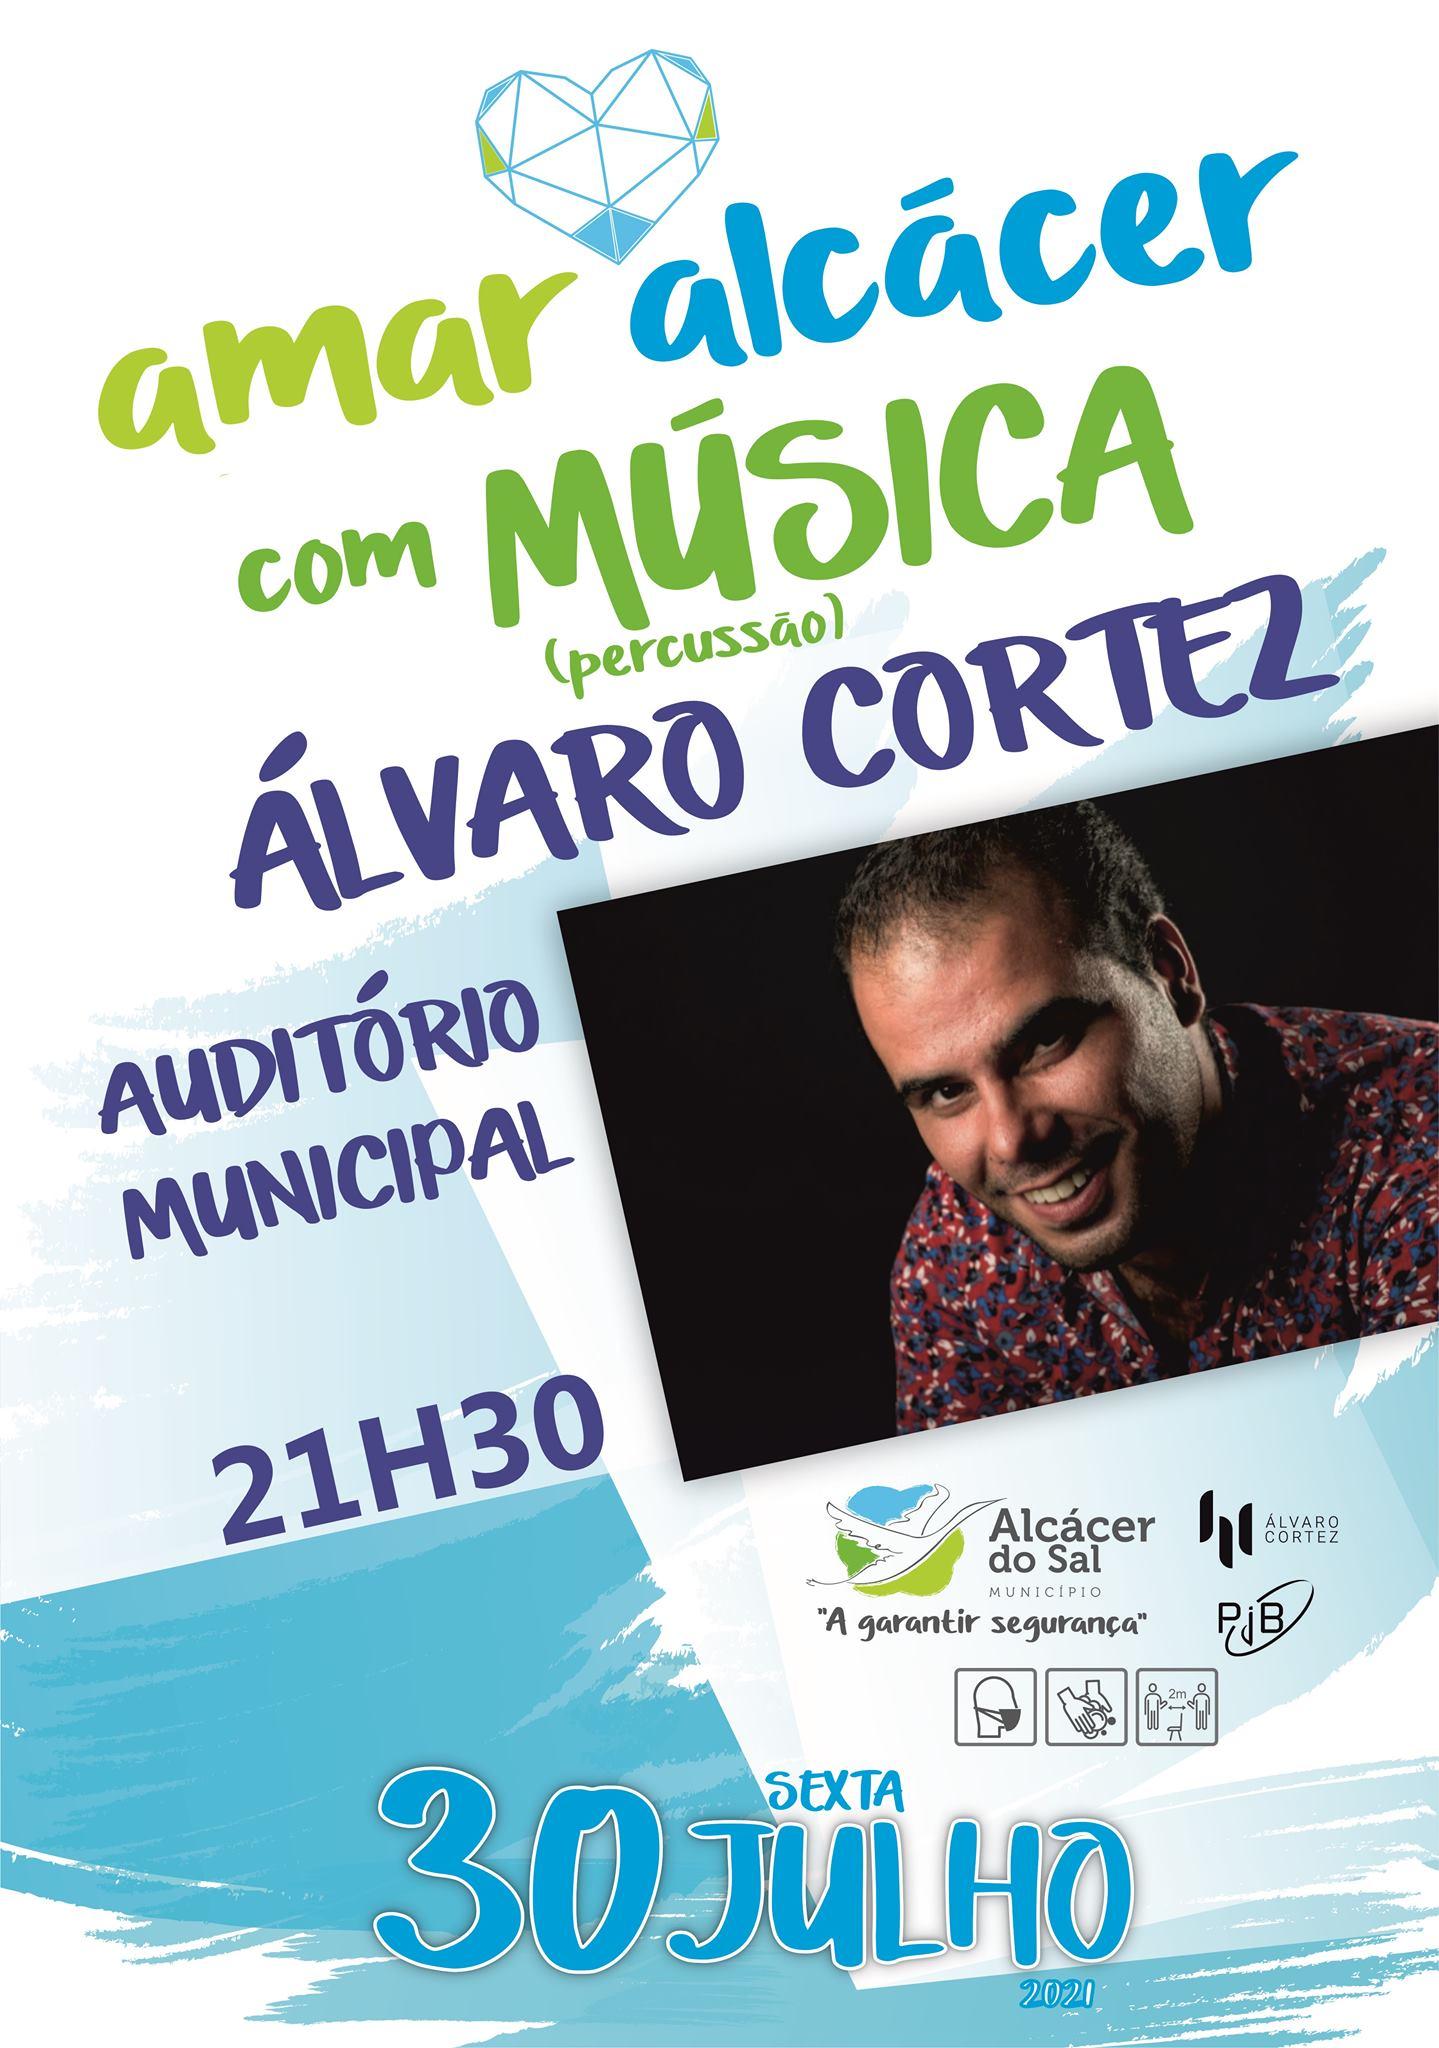 Concerto com Álvaro Cortez